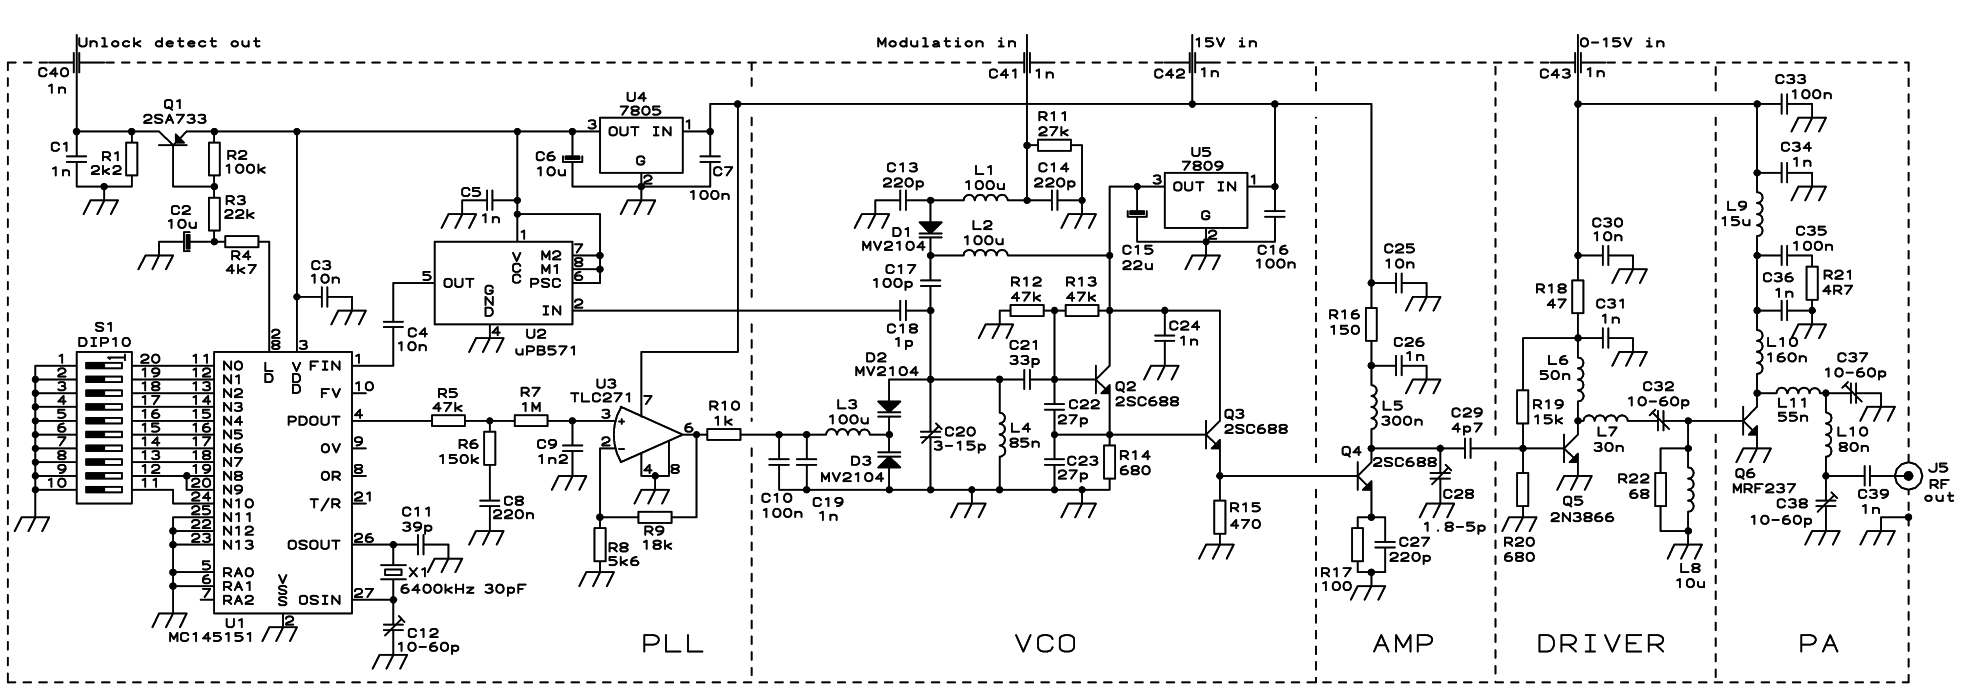 1000 Watts Power Amplifier Schematic Diagrams Pll Fm Transmitter Circuit